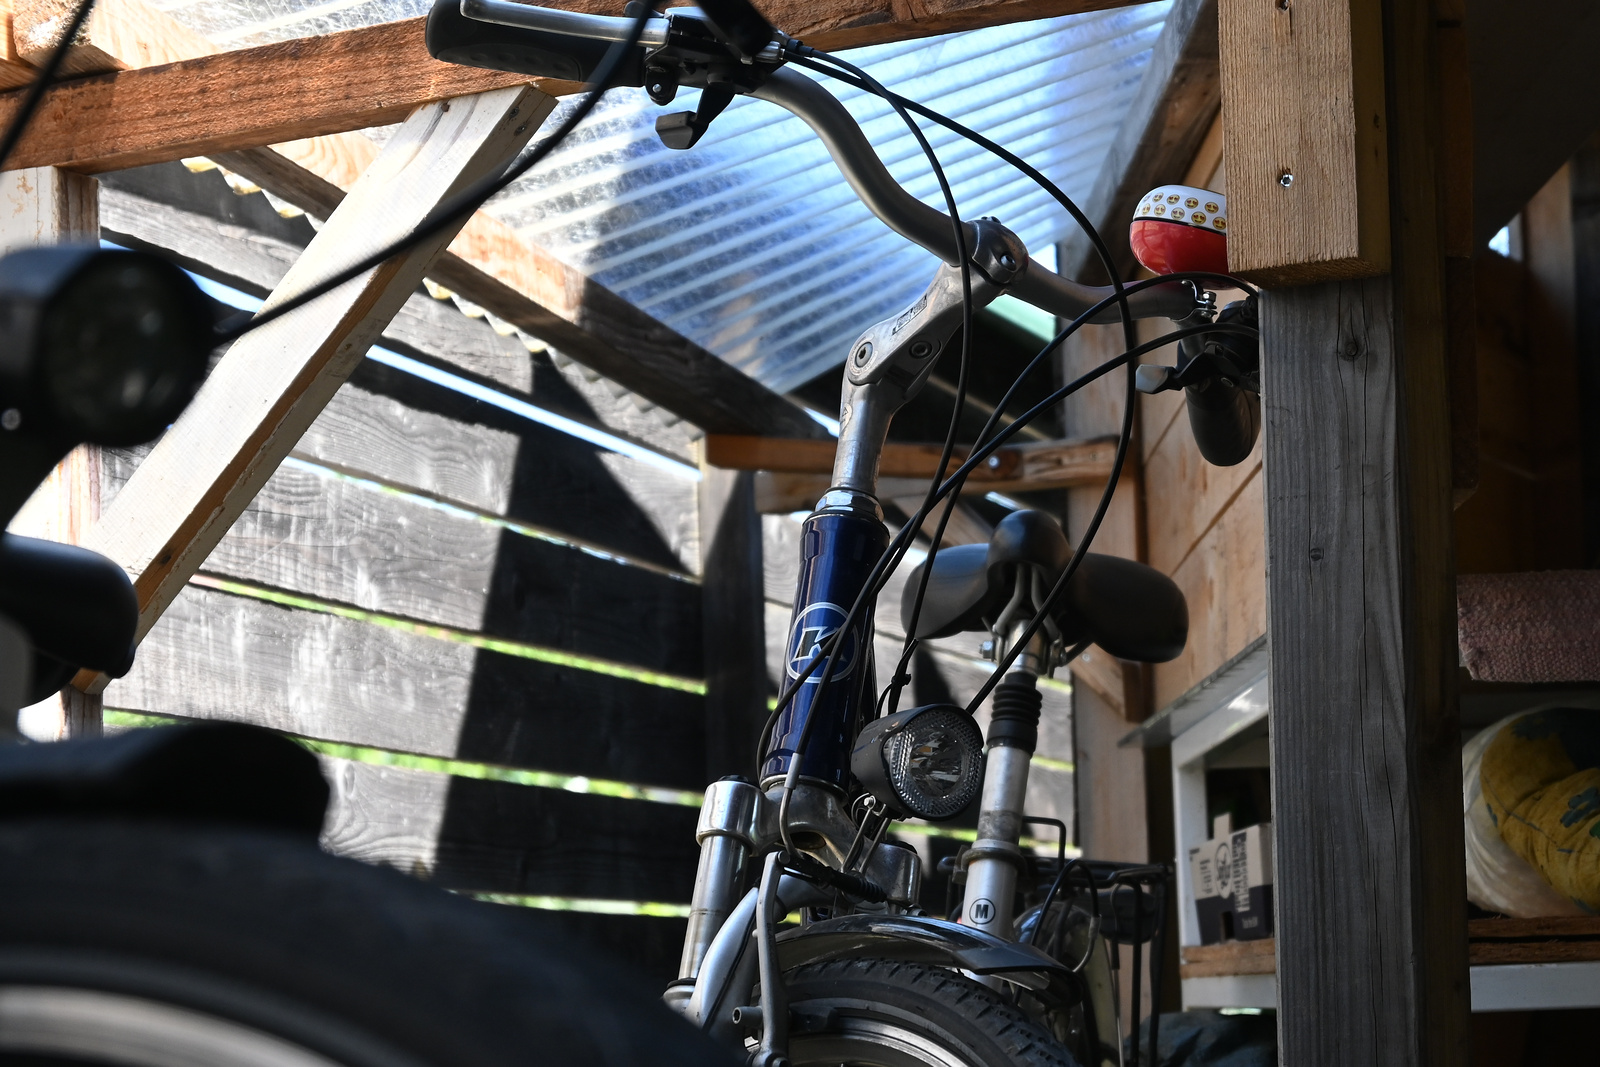 Eigenbau Fahrradgarage